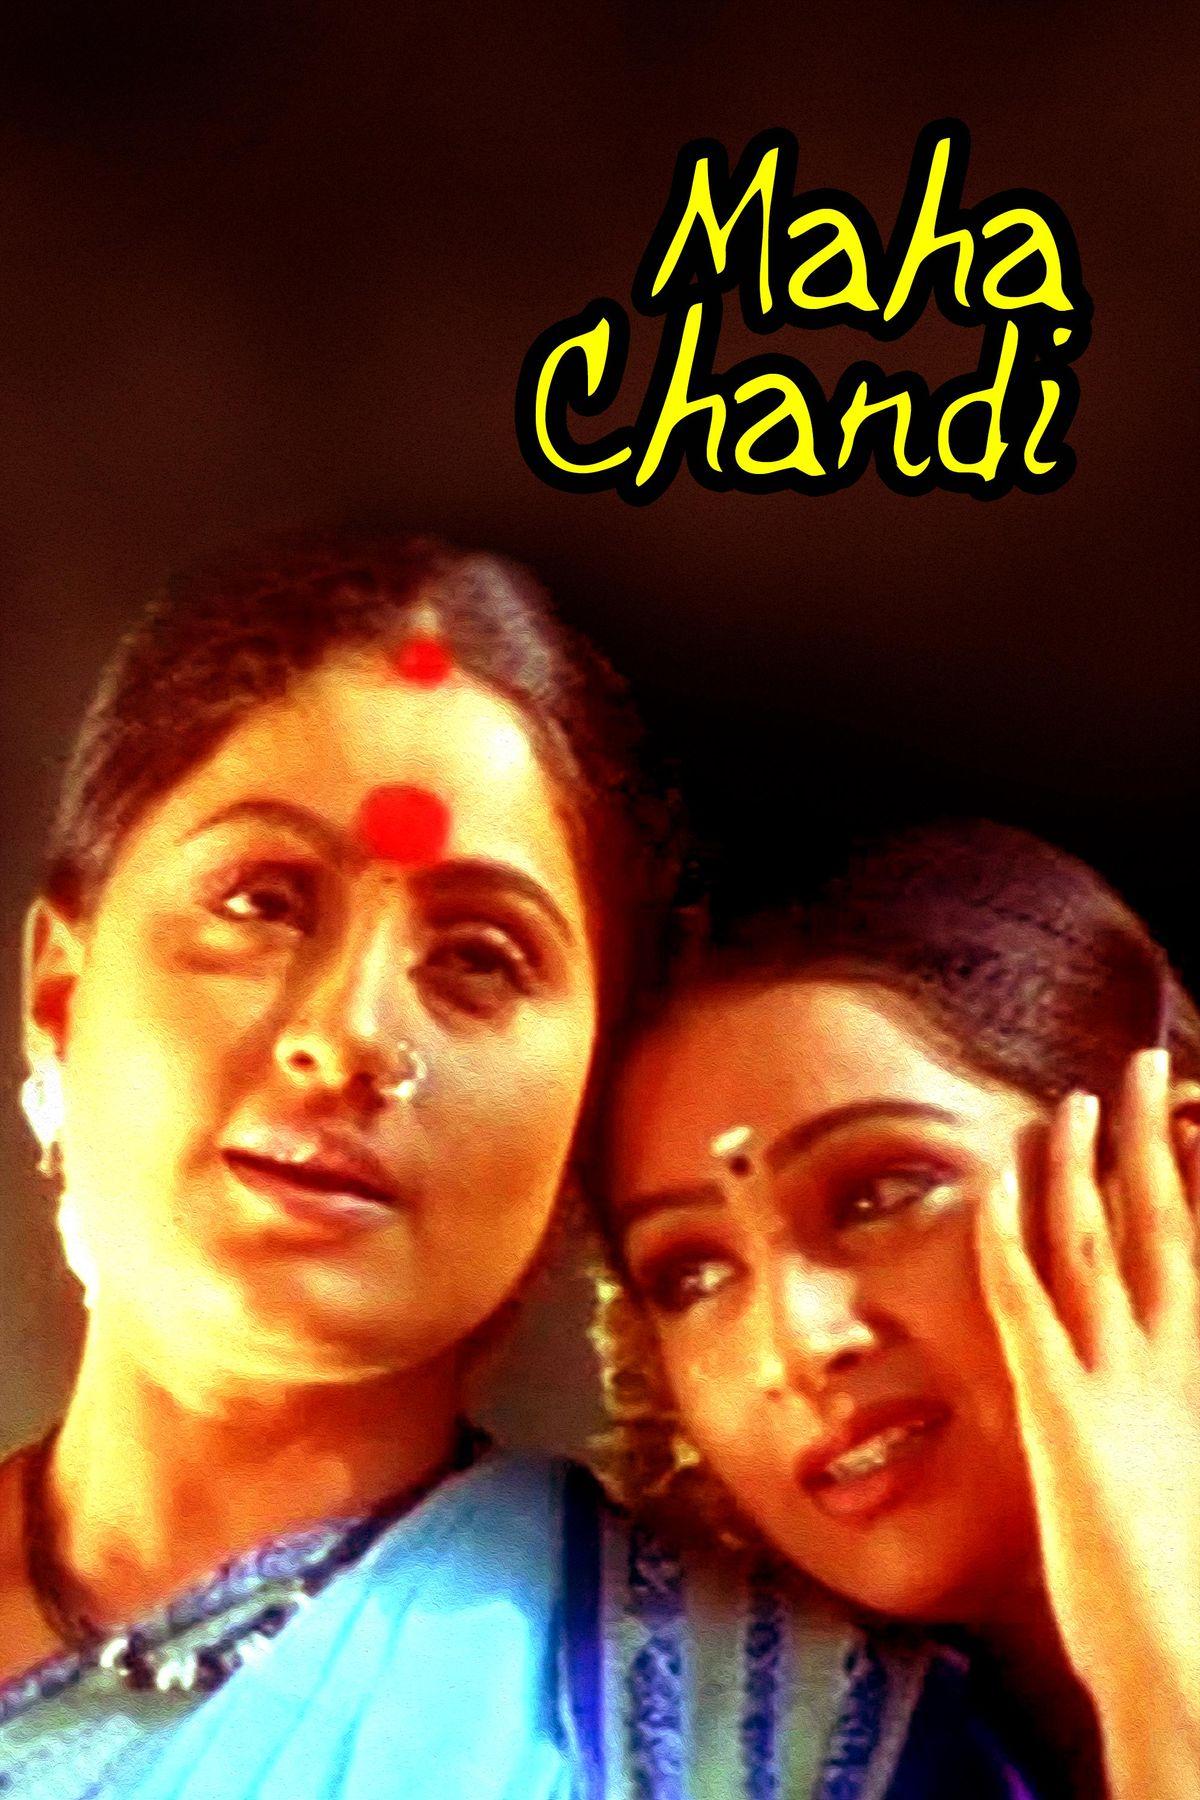 Maha Chandi